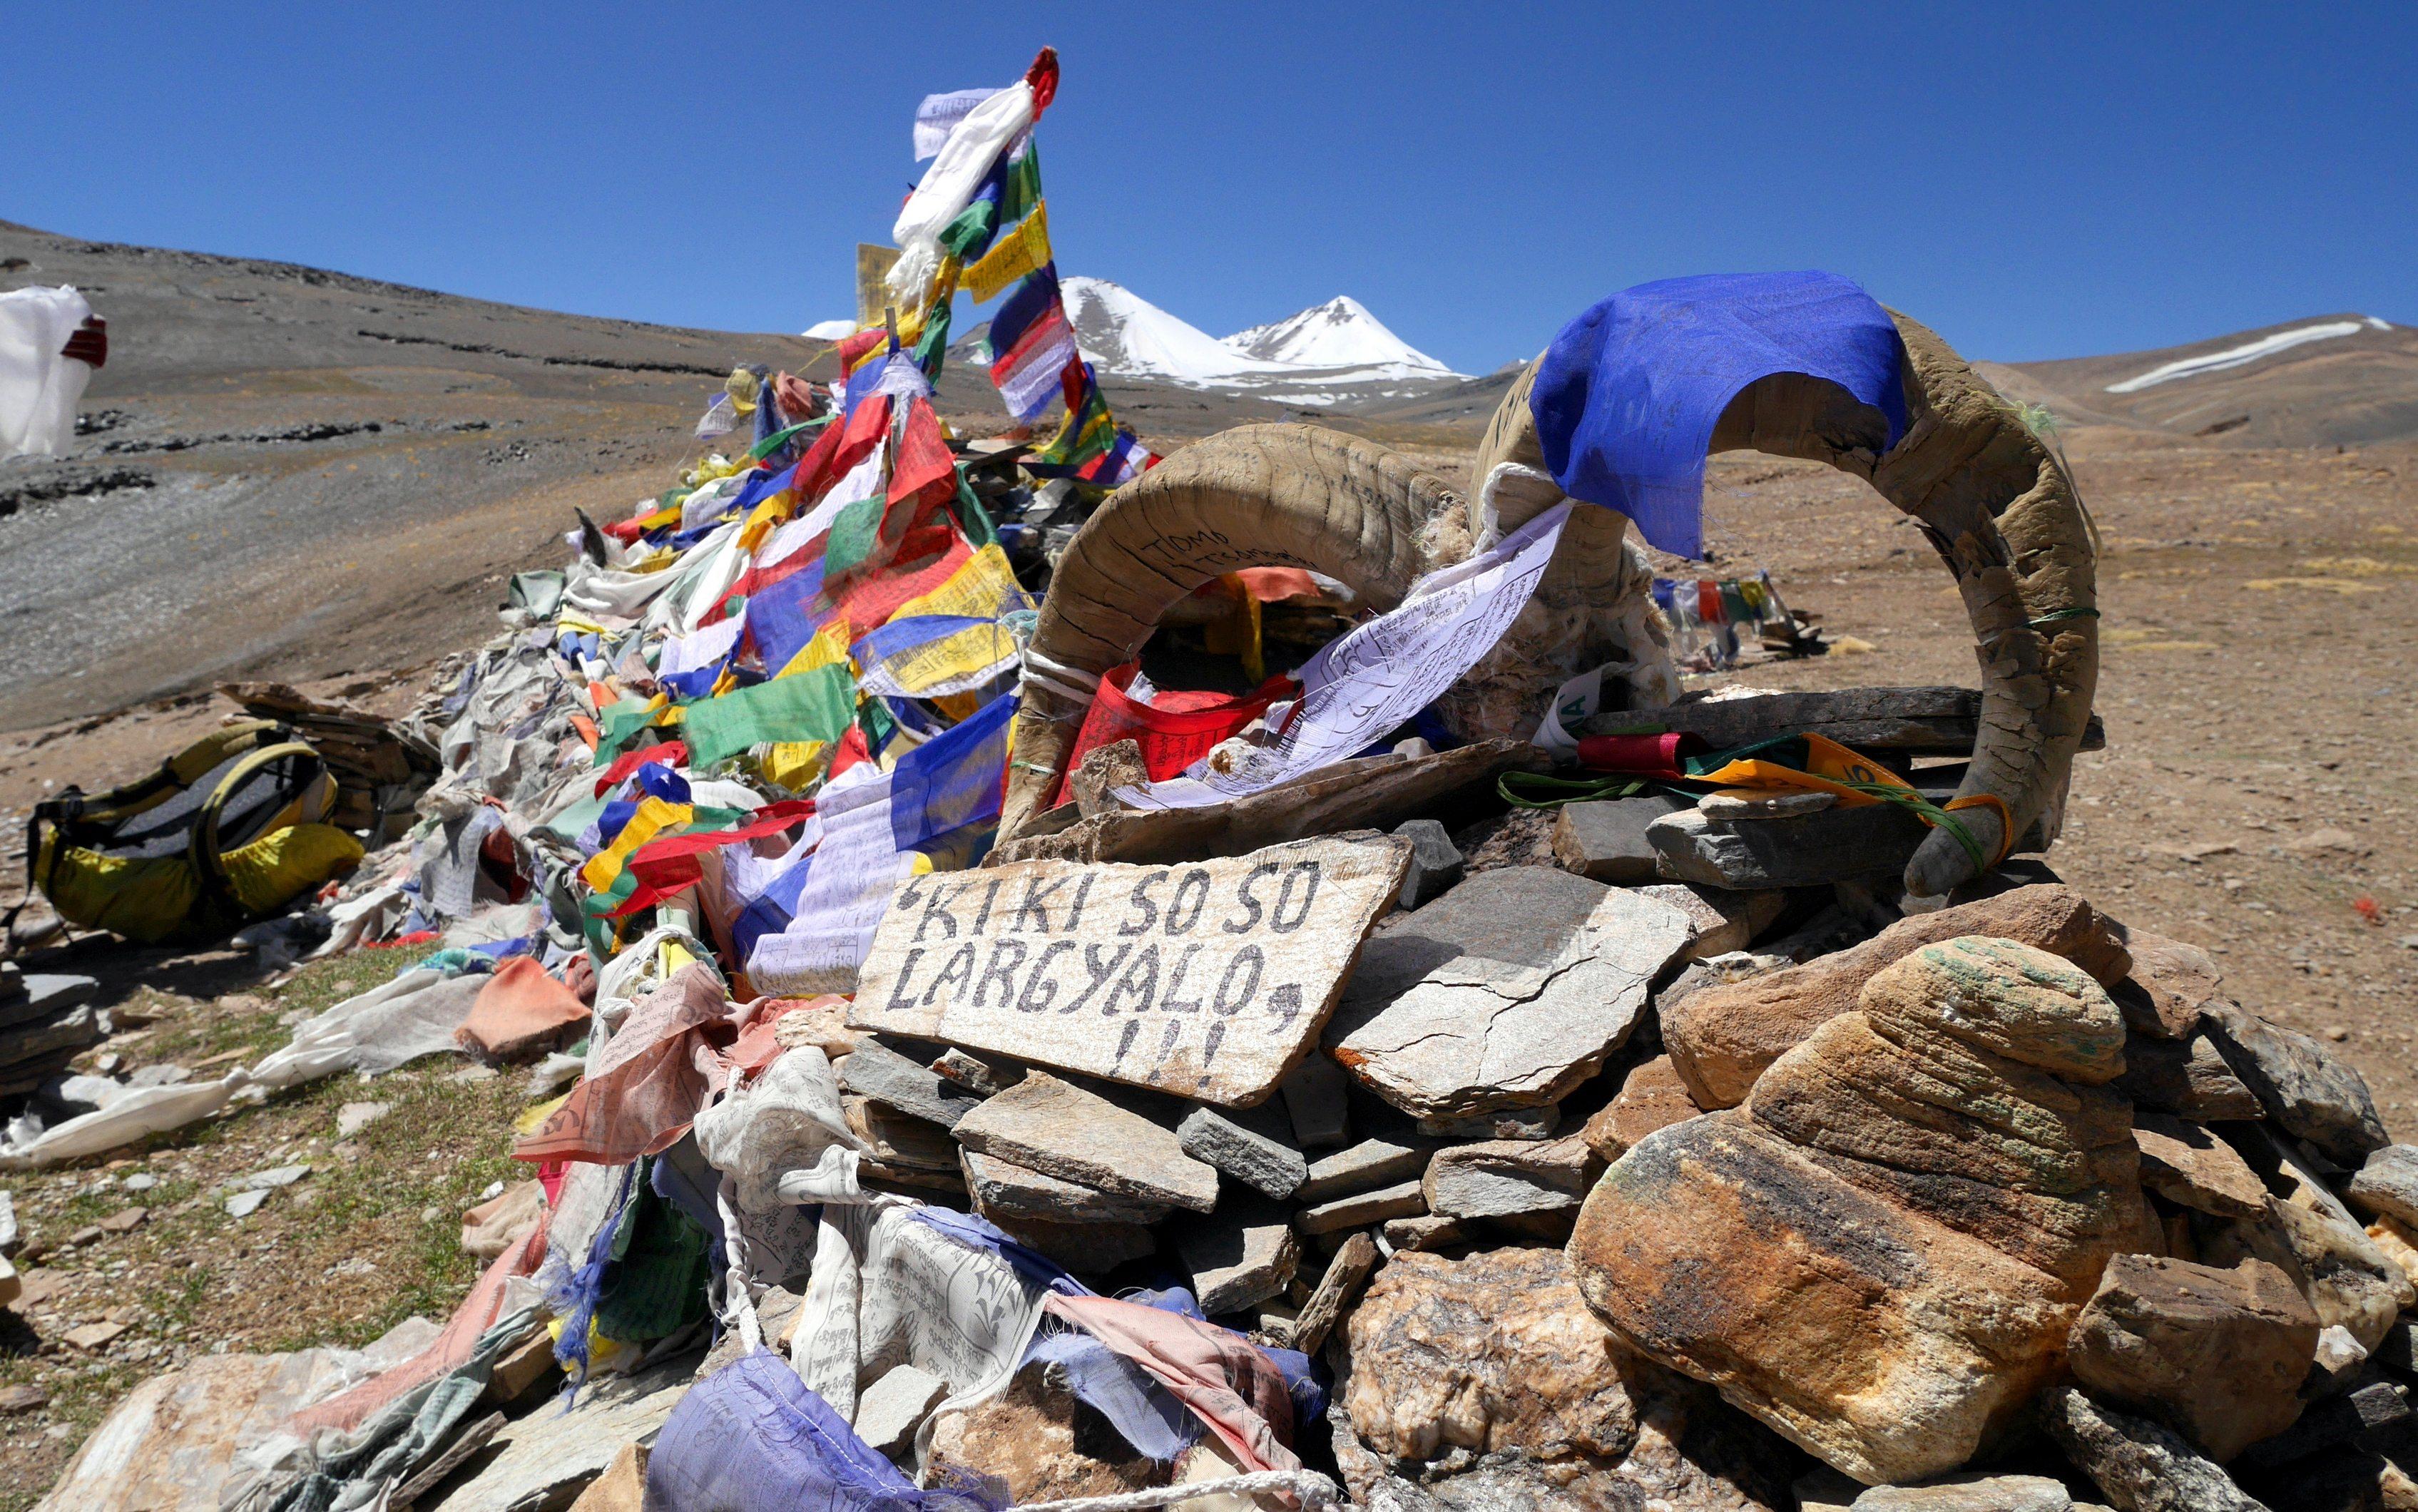 Col de Yalung Nyau La (5430m)